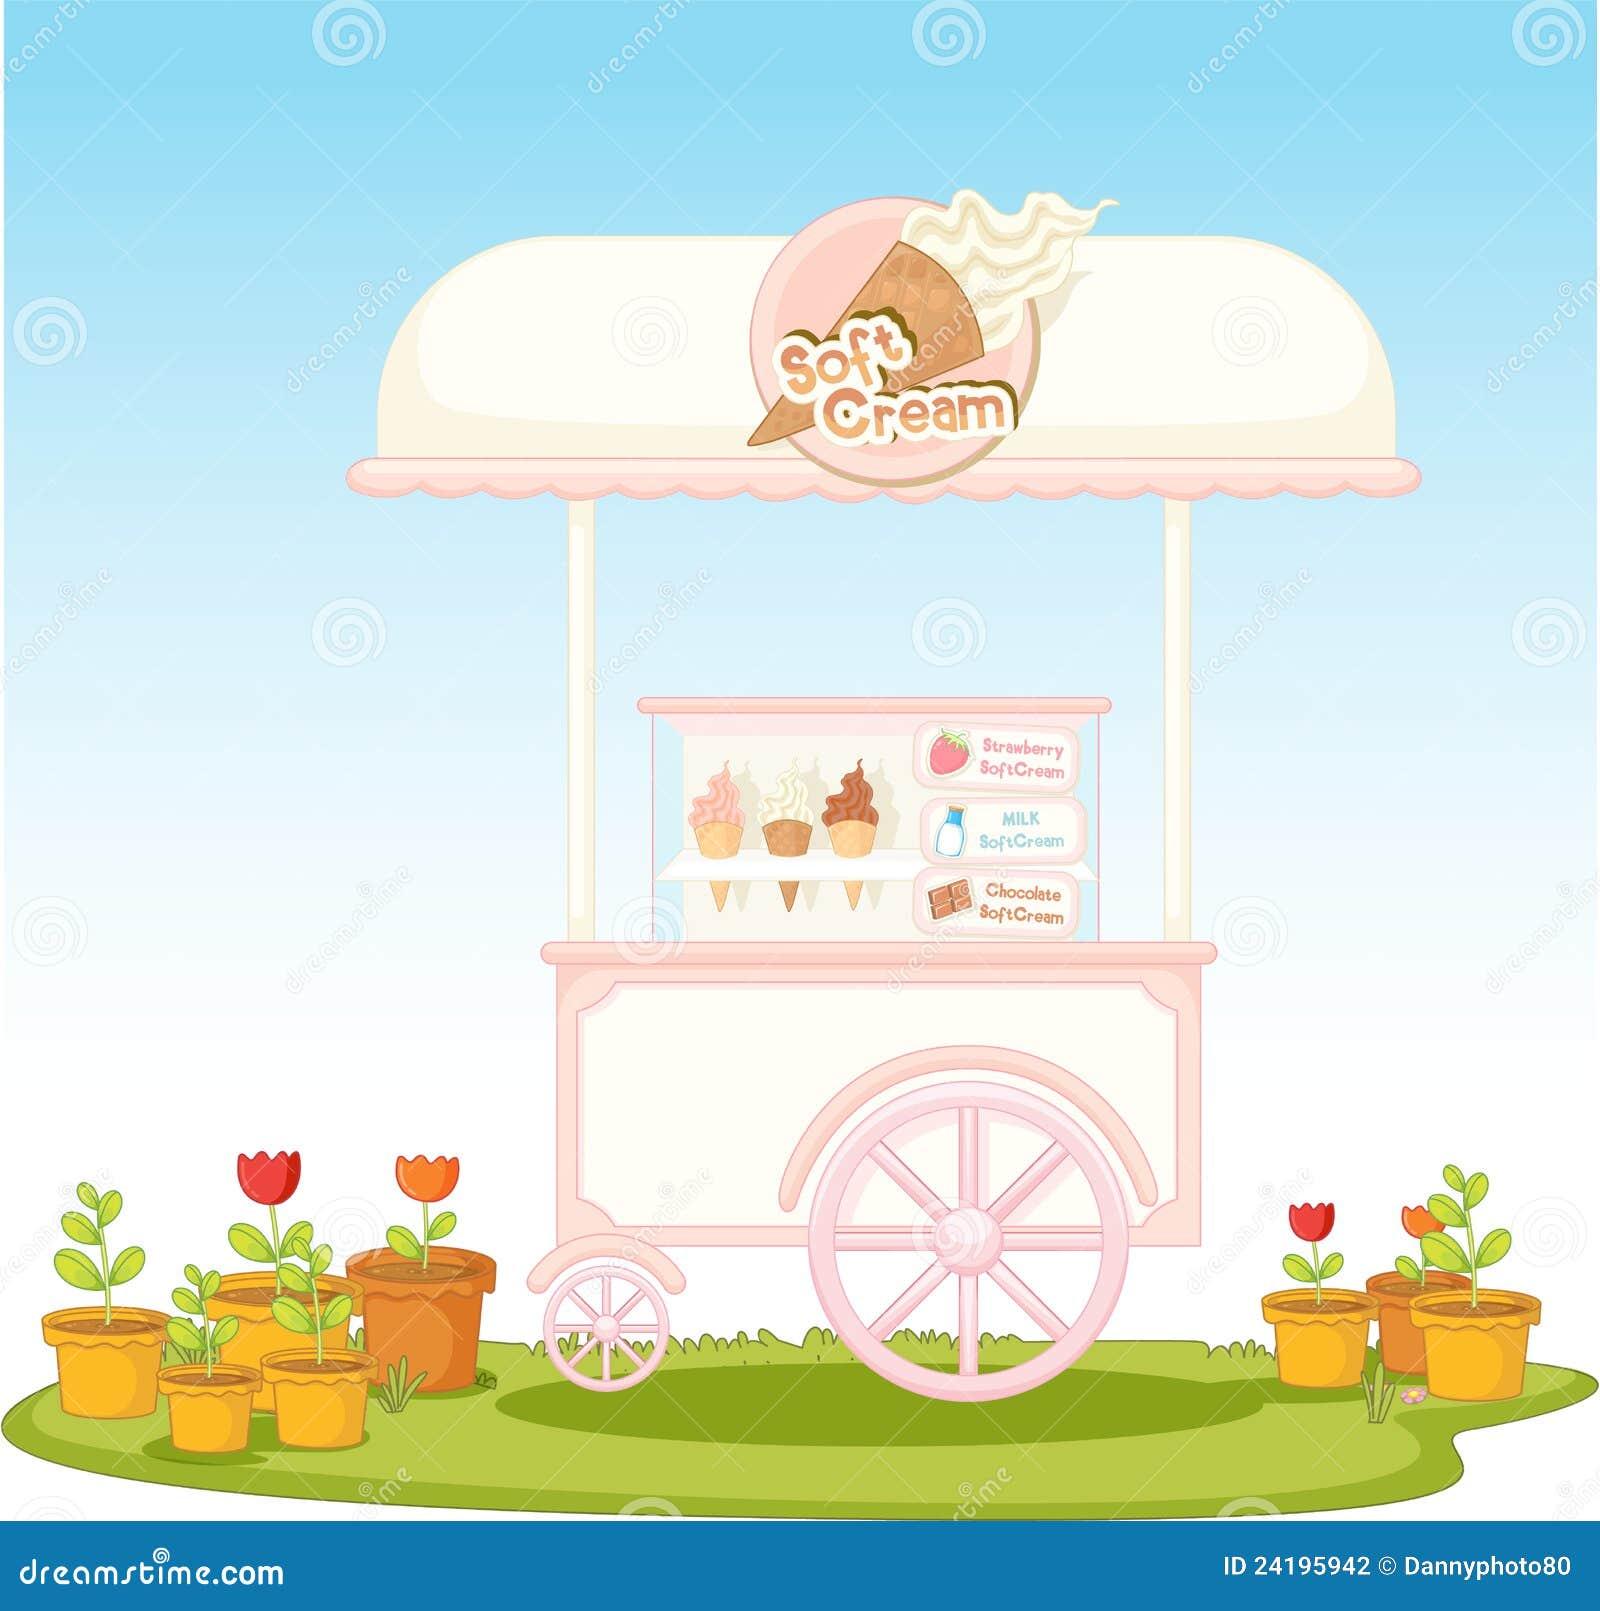 Starting an Ice Cream Shop